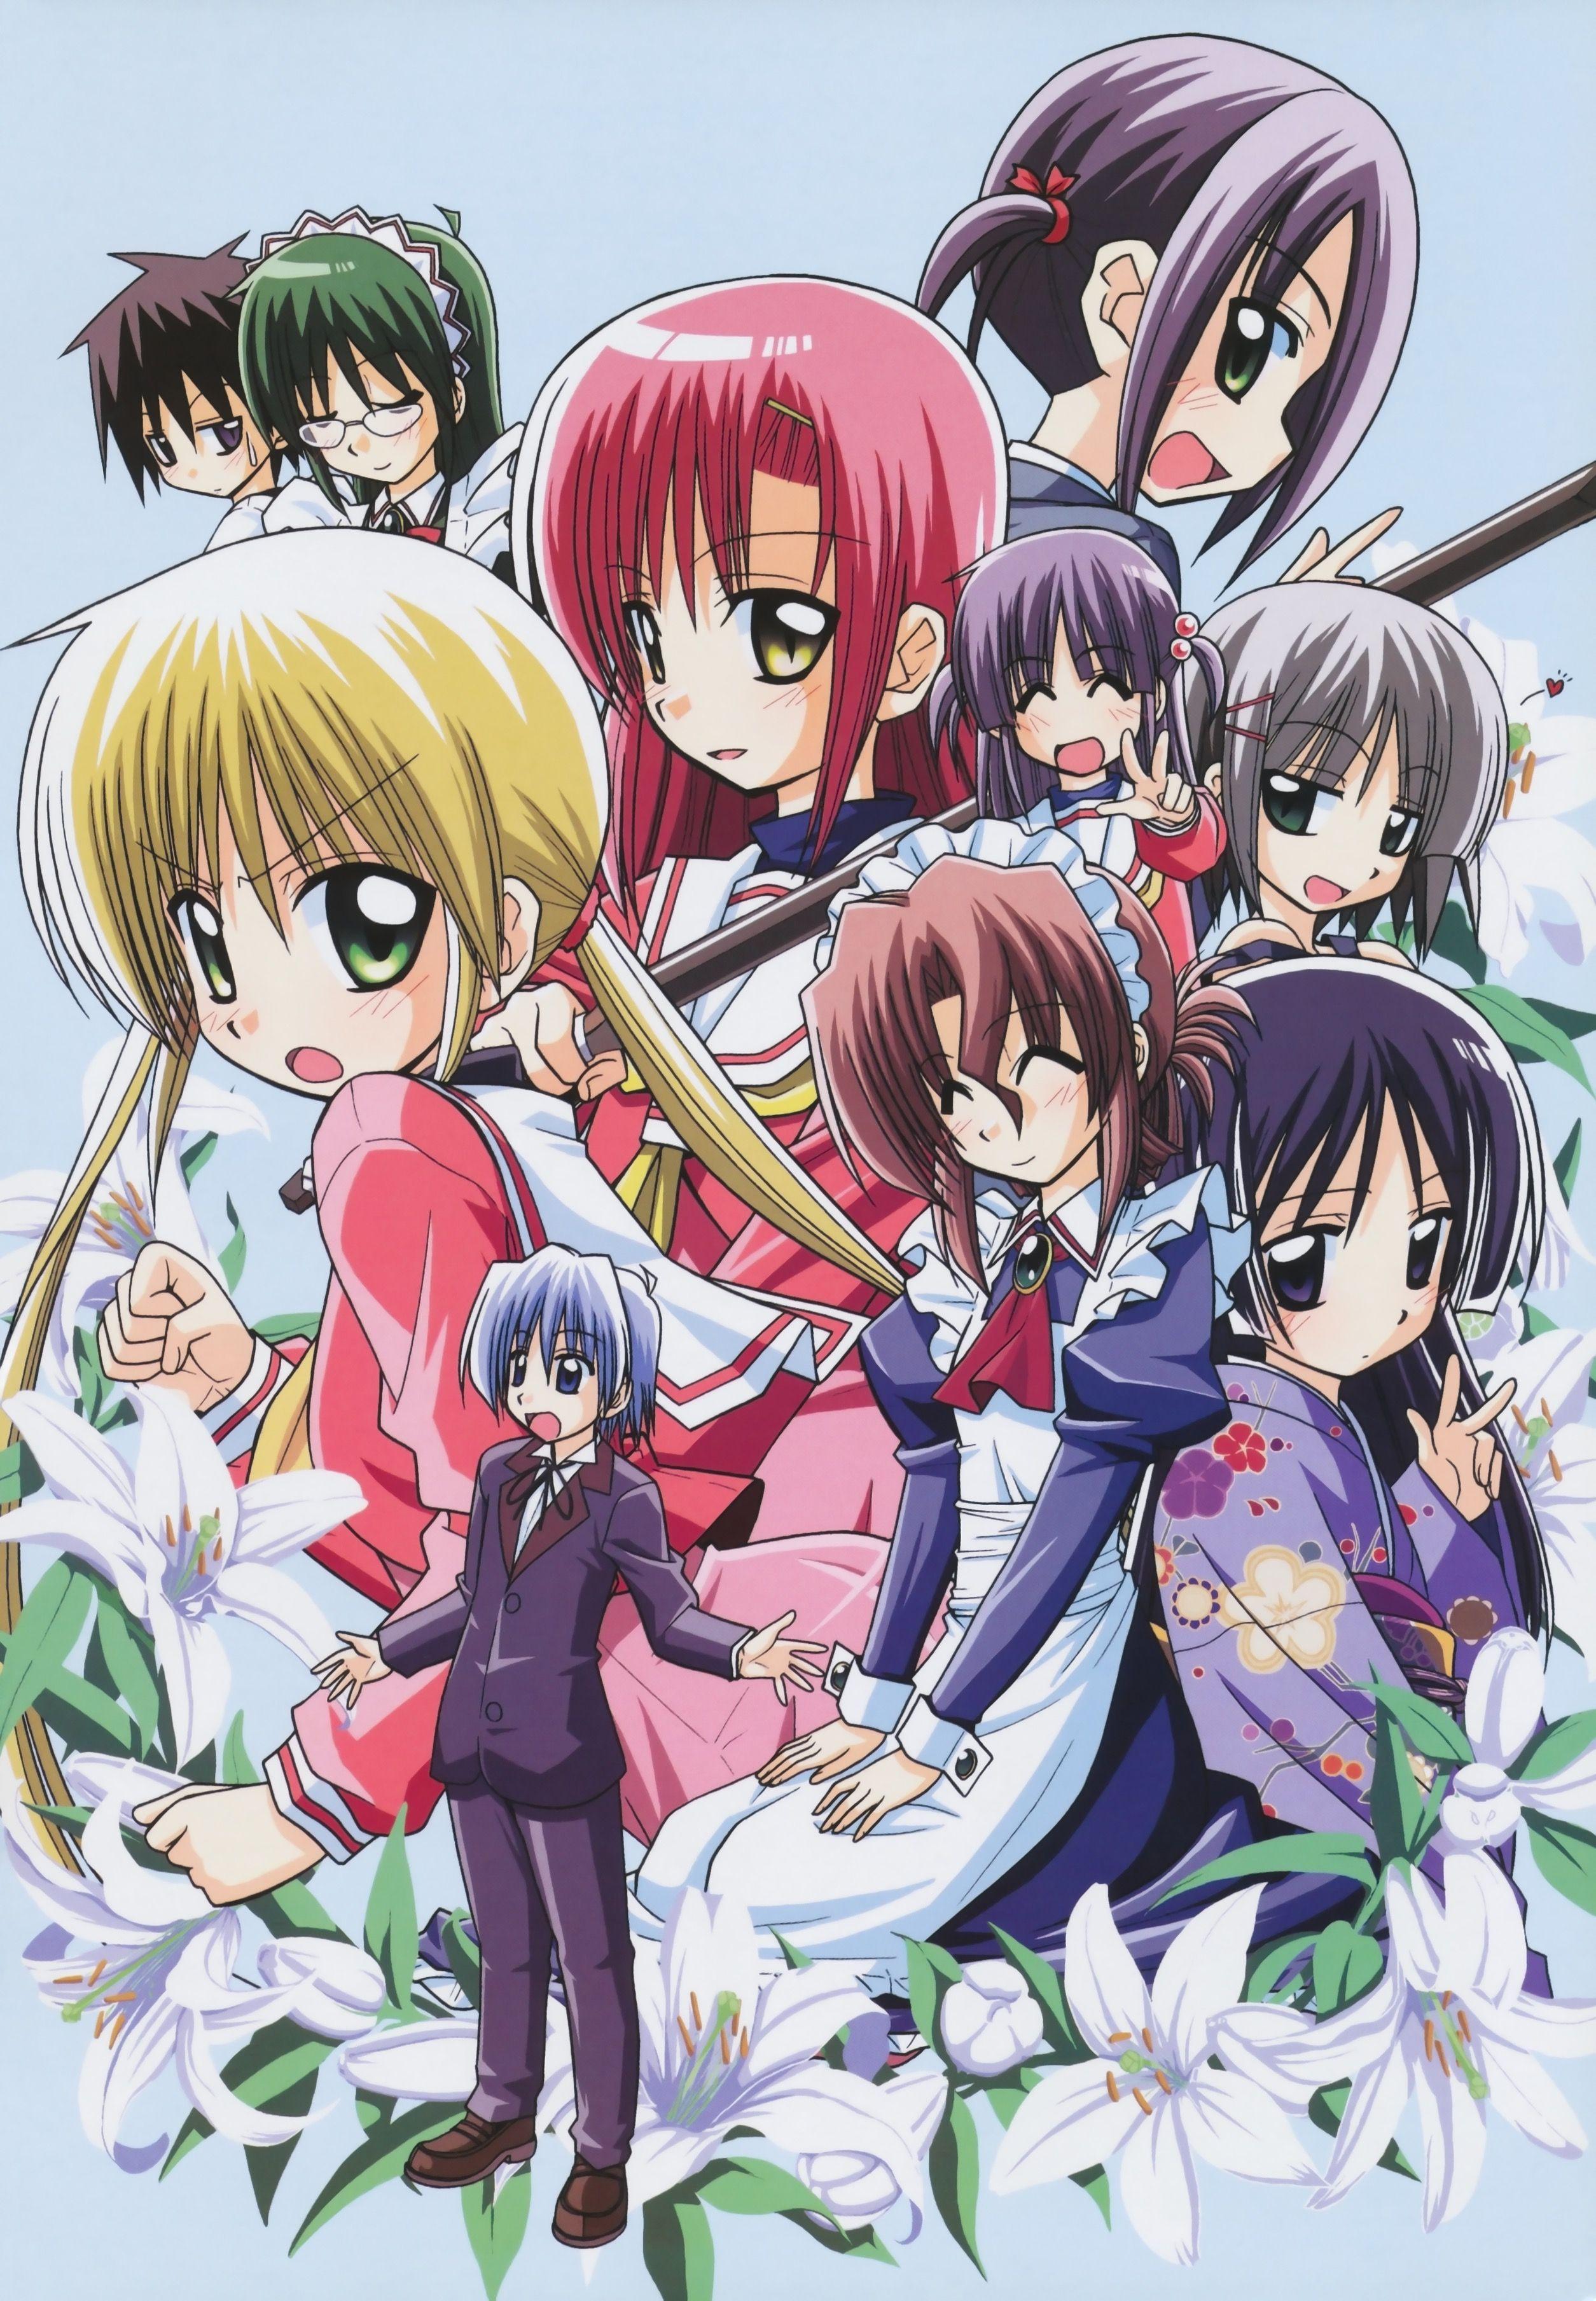 Hayate No Gotoku Part 1 Y2ldef ハヤテのごとく Hayate No Gotoku Hayate No Gotoku Hayate Anime Anime Wallpaper